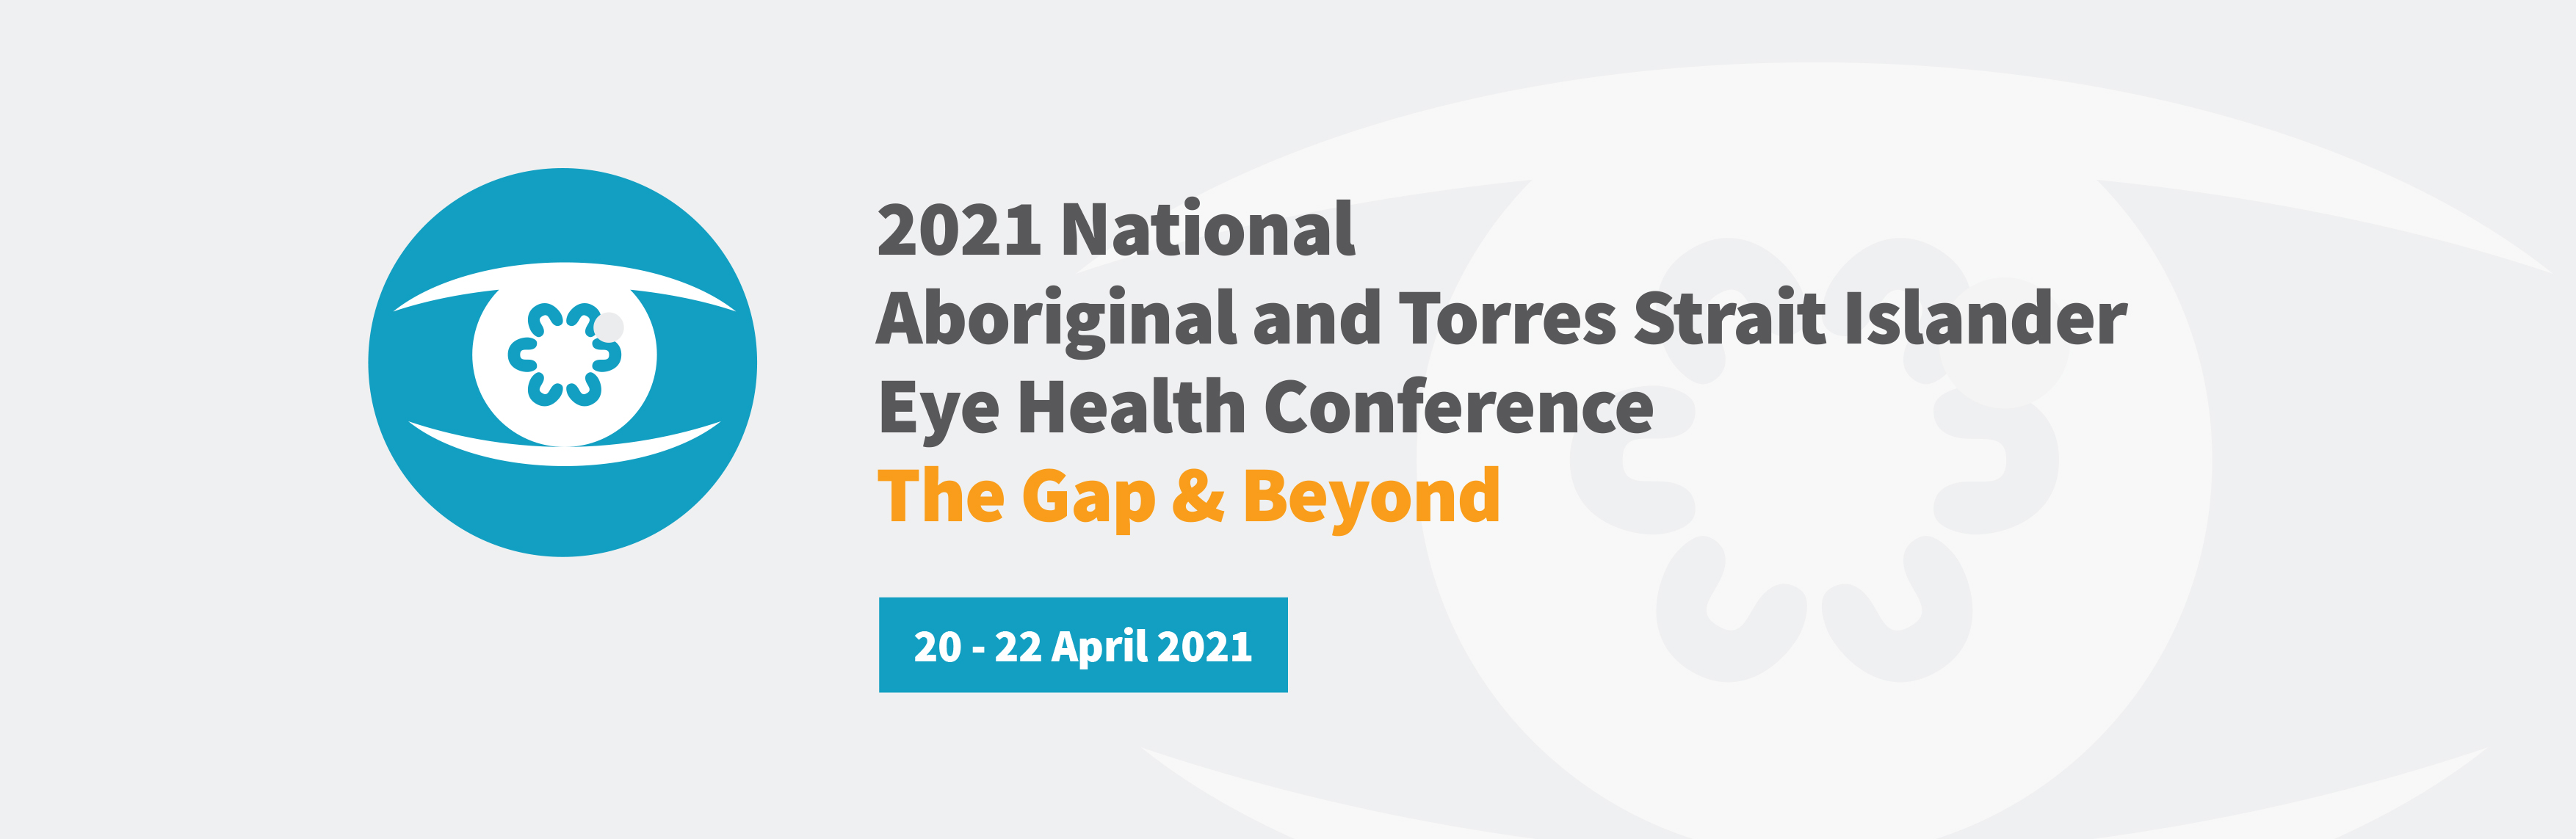 2021 National Aboriginal and Torres Strait Islander Eye Health Conference The Gap & Beyond